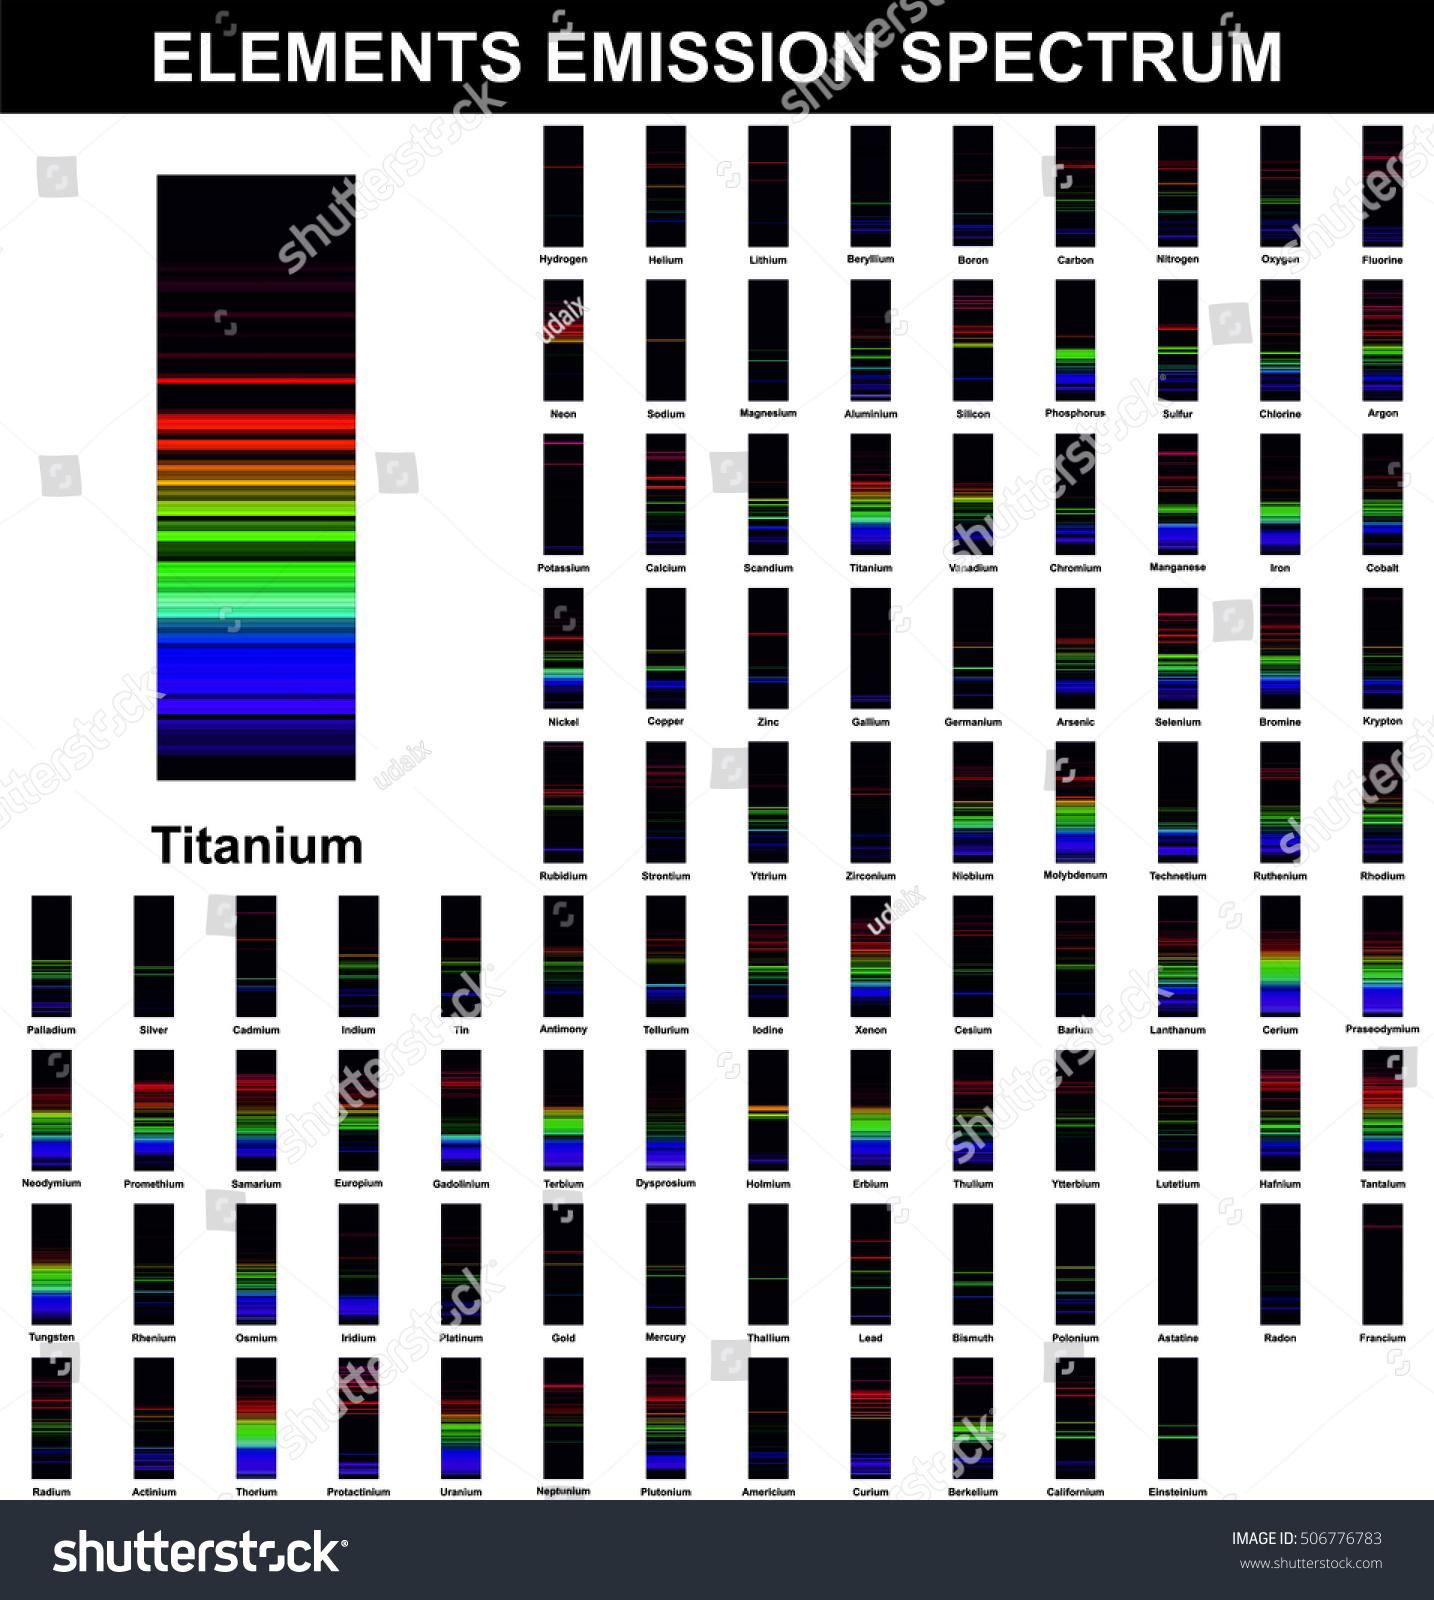 Chemical Elements Emission Spectrum Each Element」のイラスト素材 ...